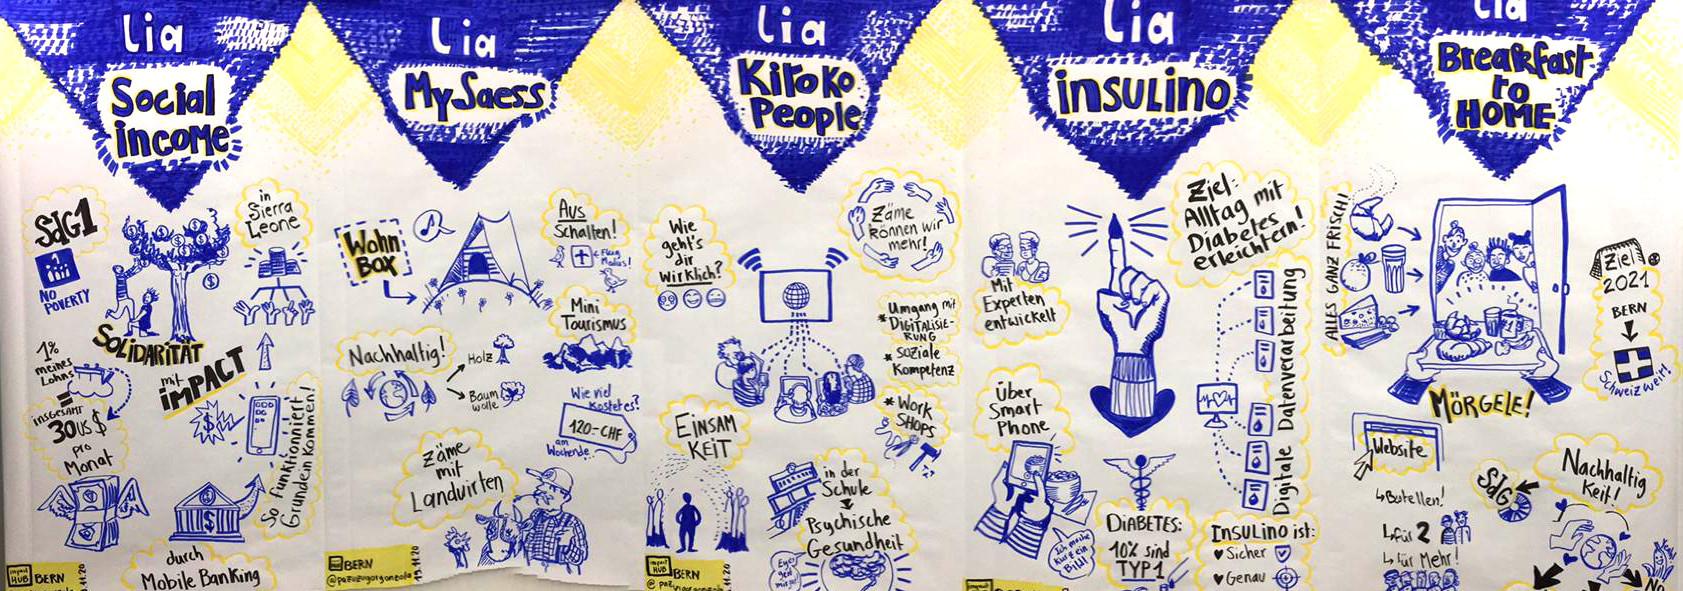 LIA - Lean innovation award 2020